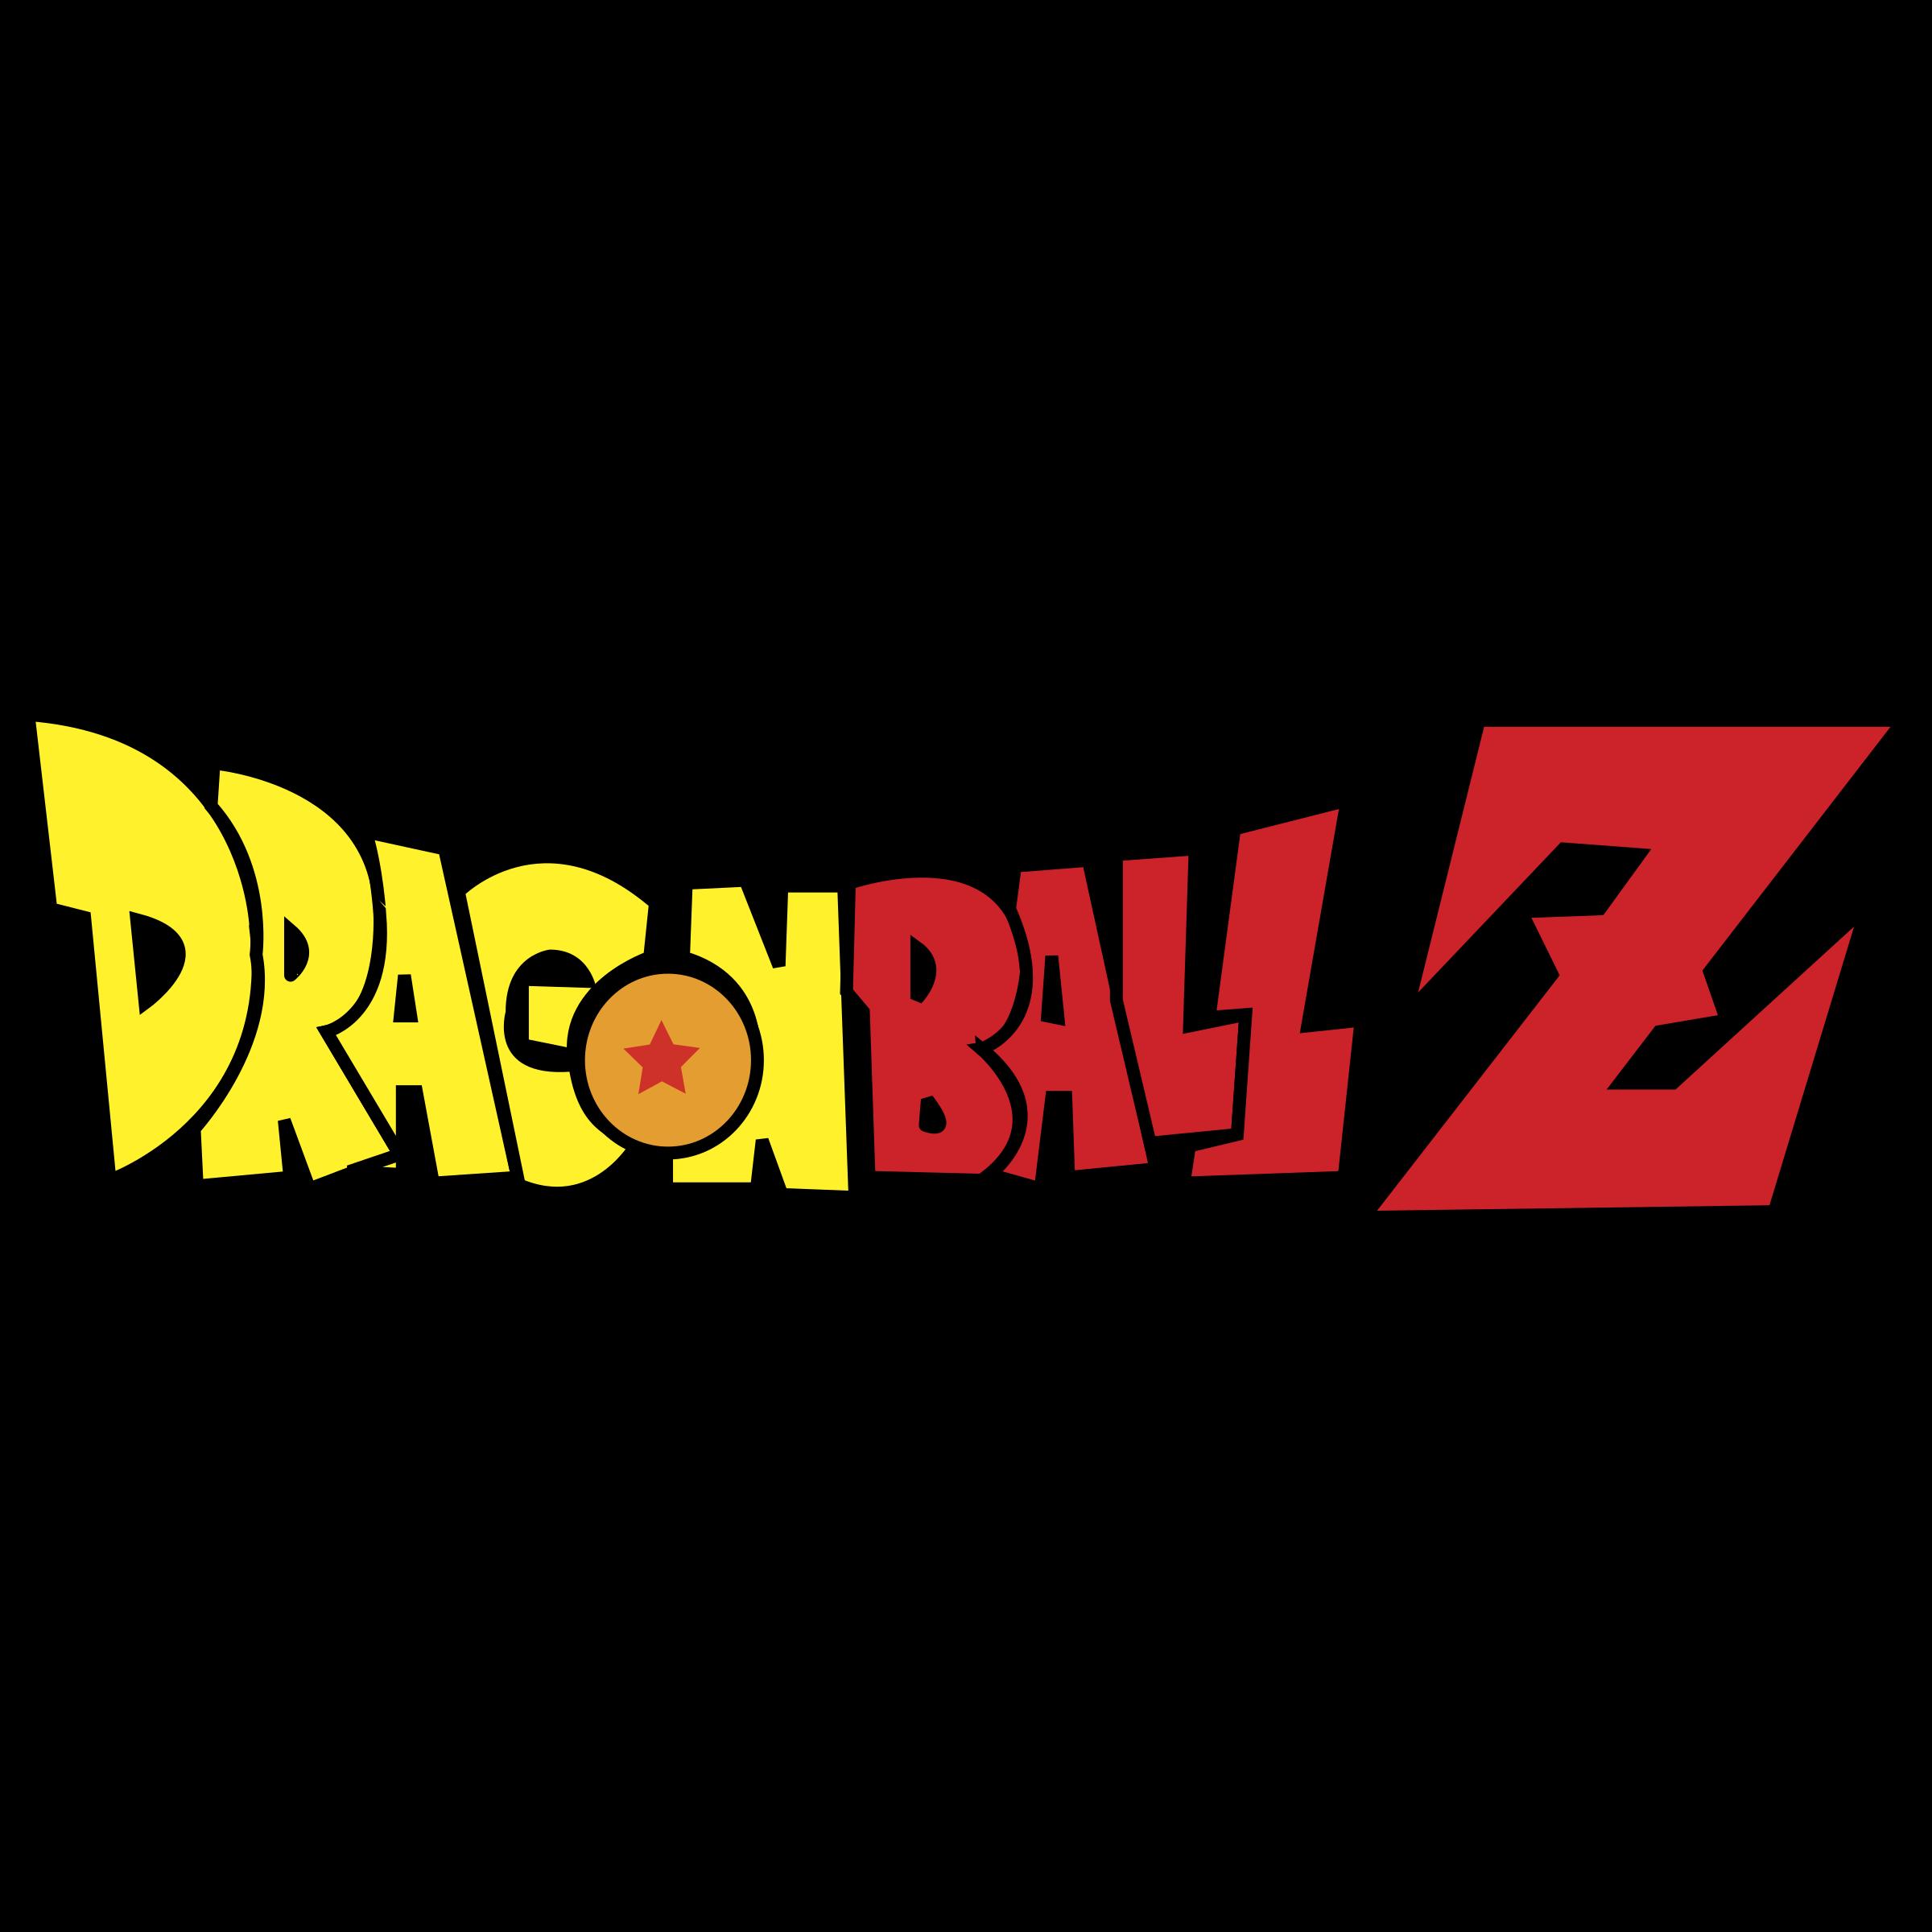 DragonBall Z Logo PNG Transparent & SVG Vector.